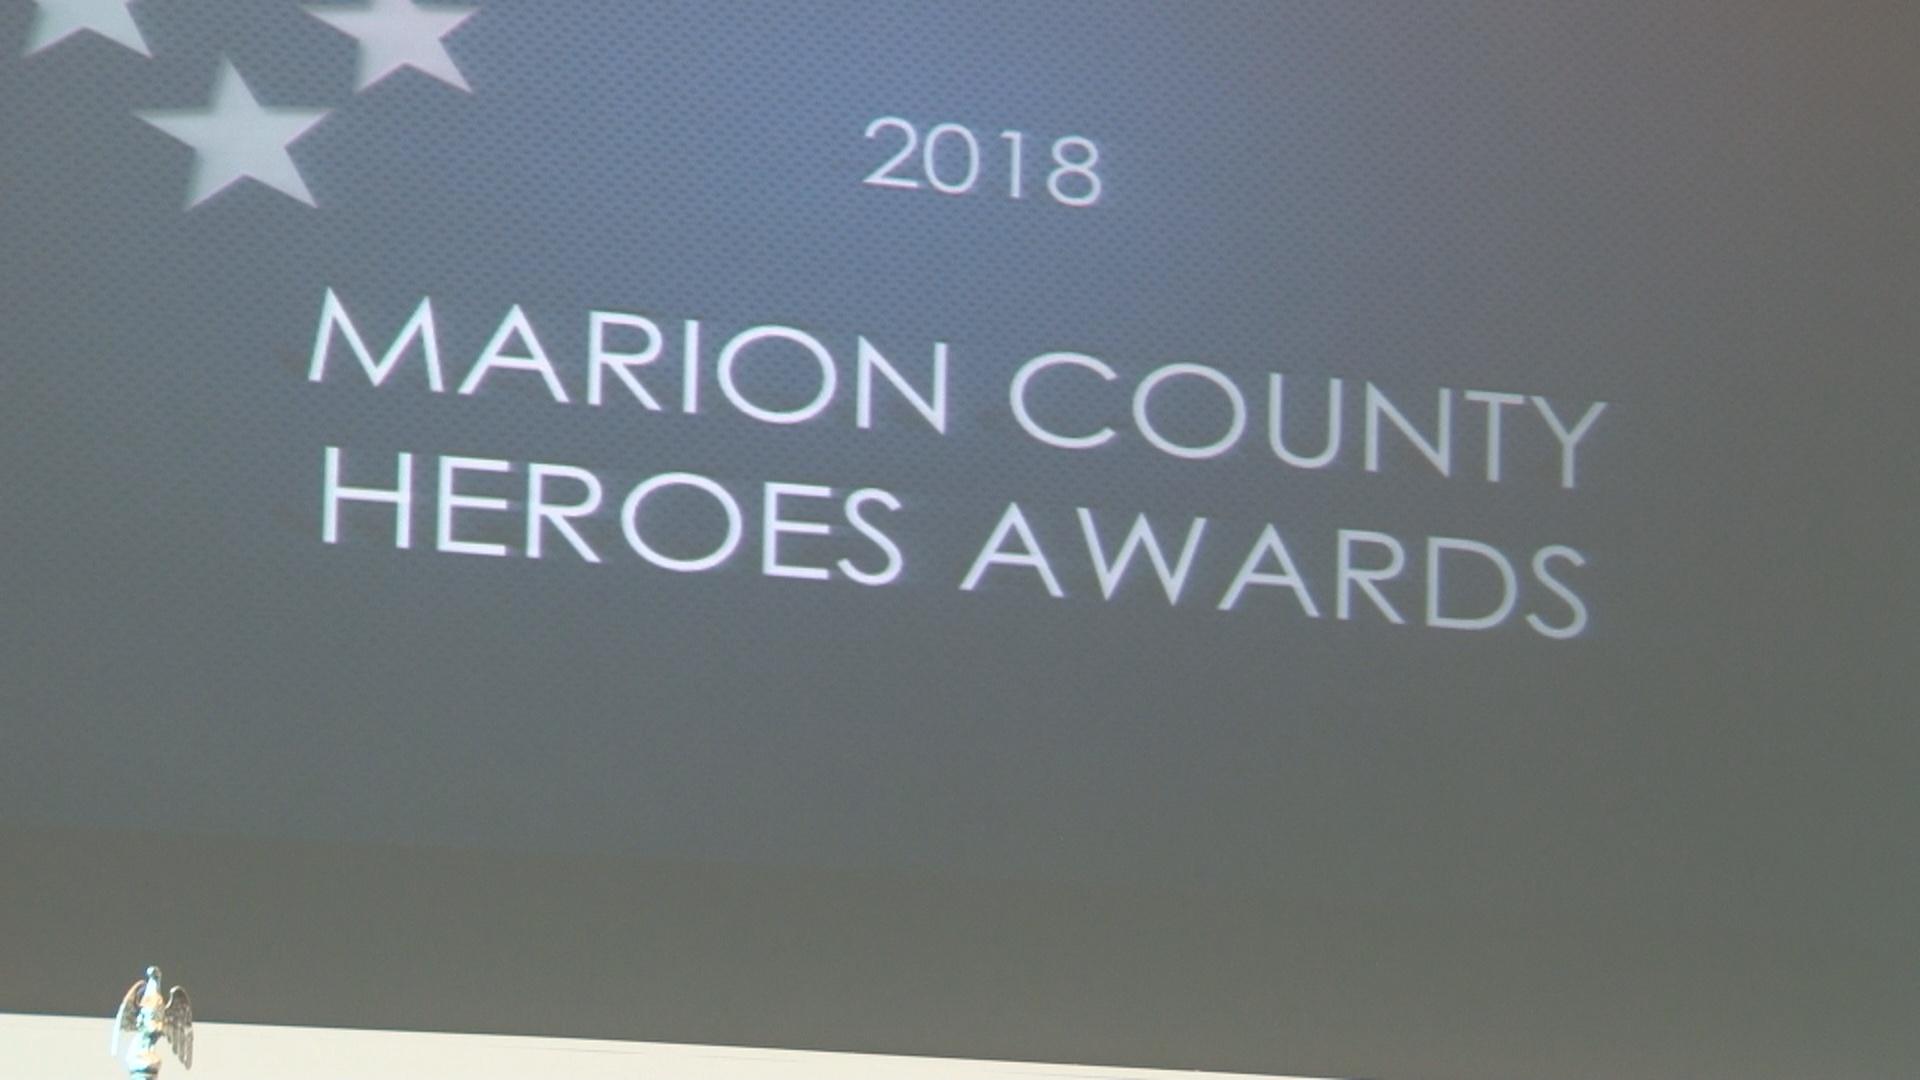 Marco Hero Awards 2018_1523667989076.jpg.jpg